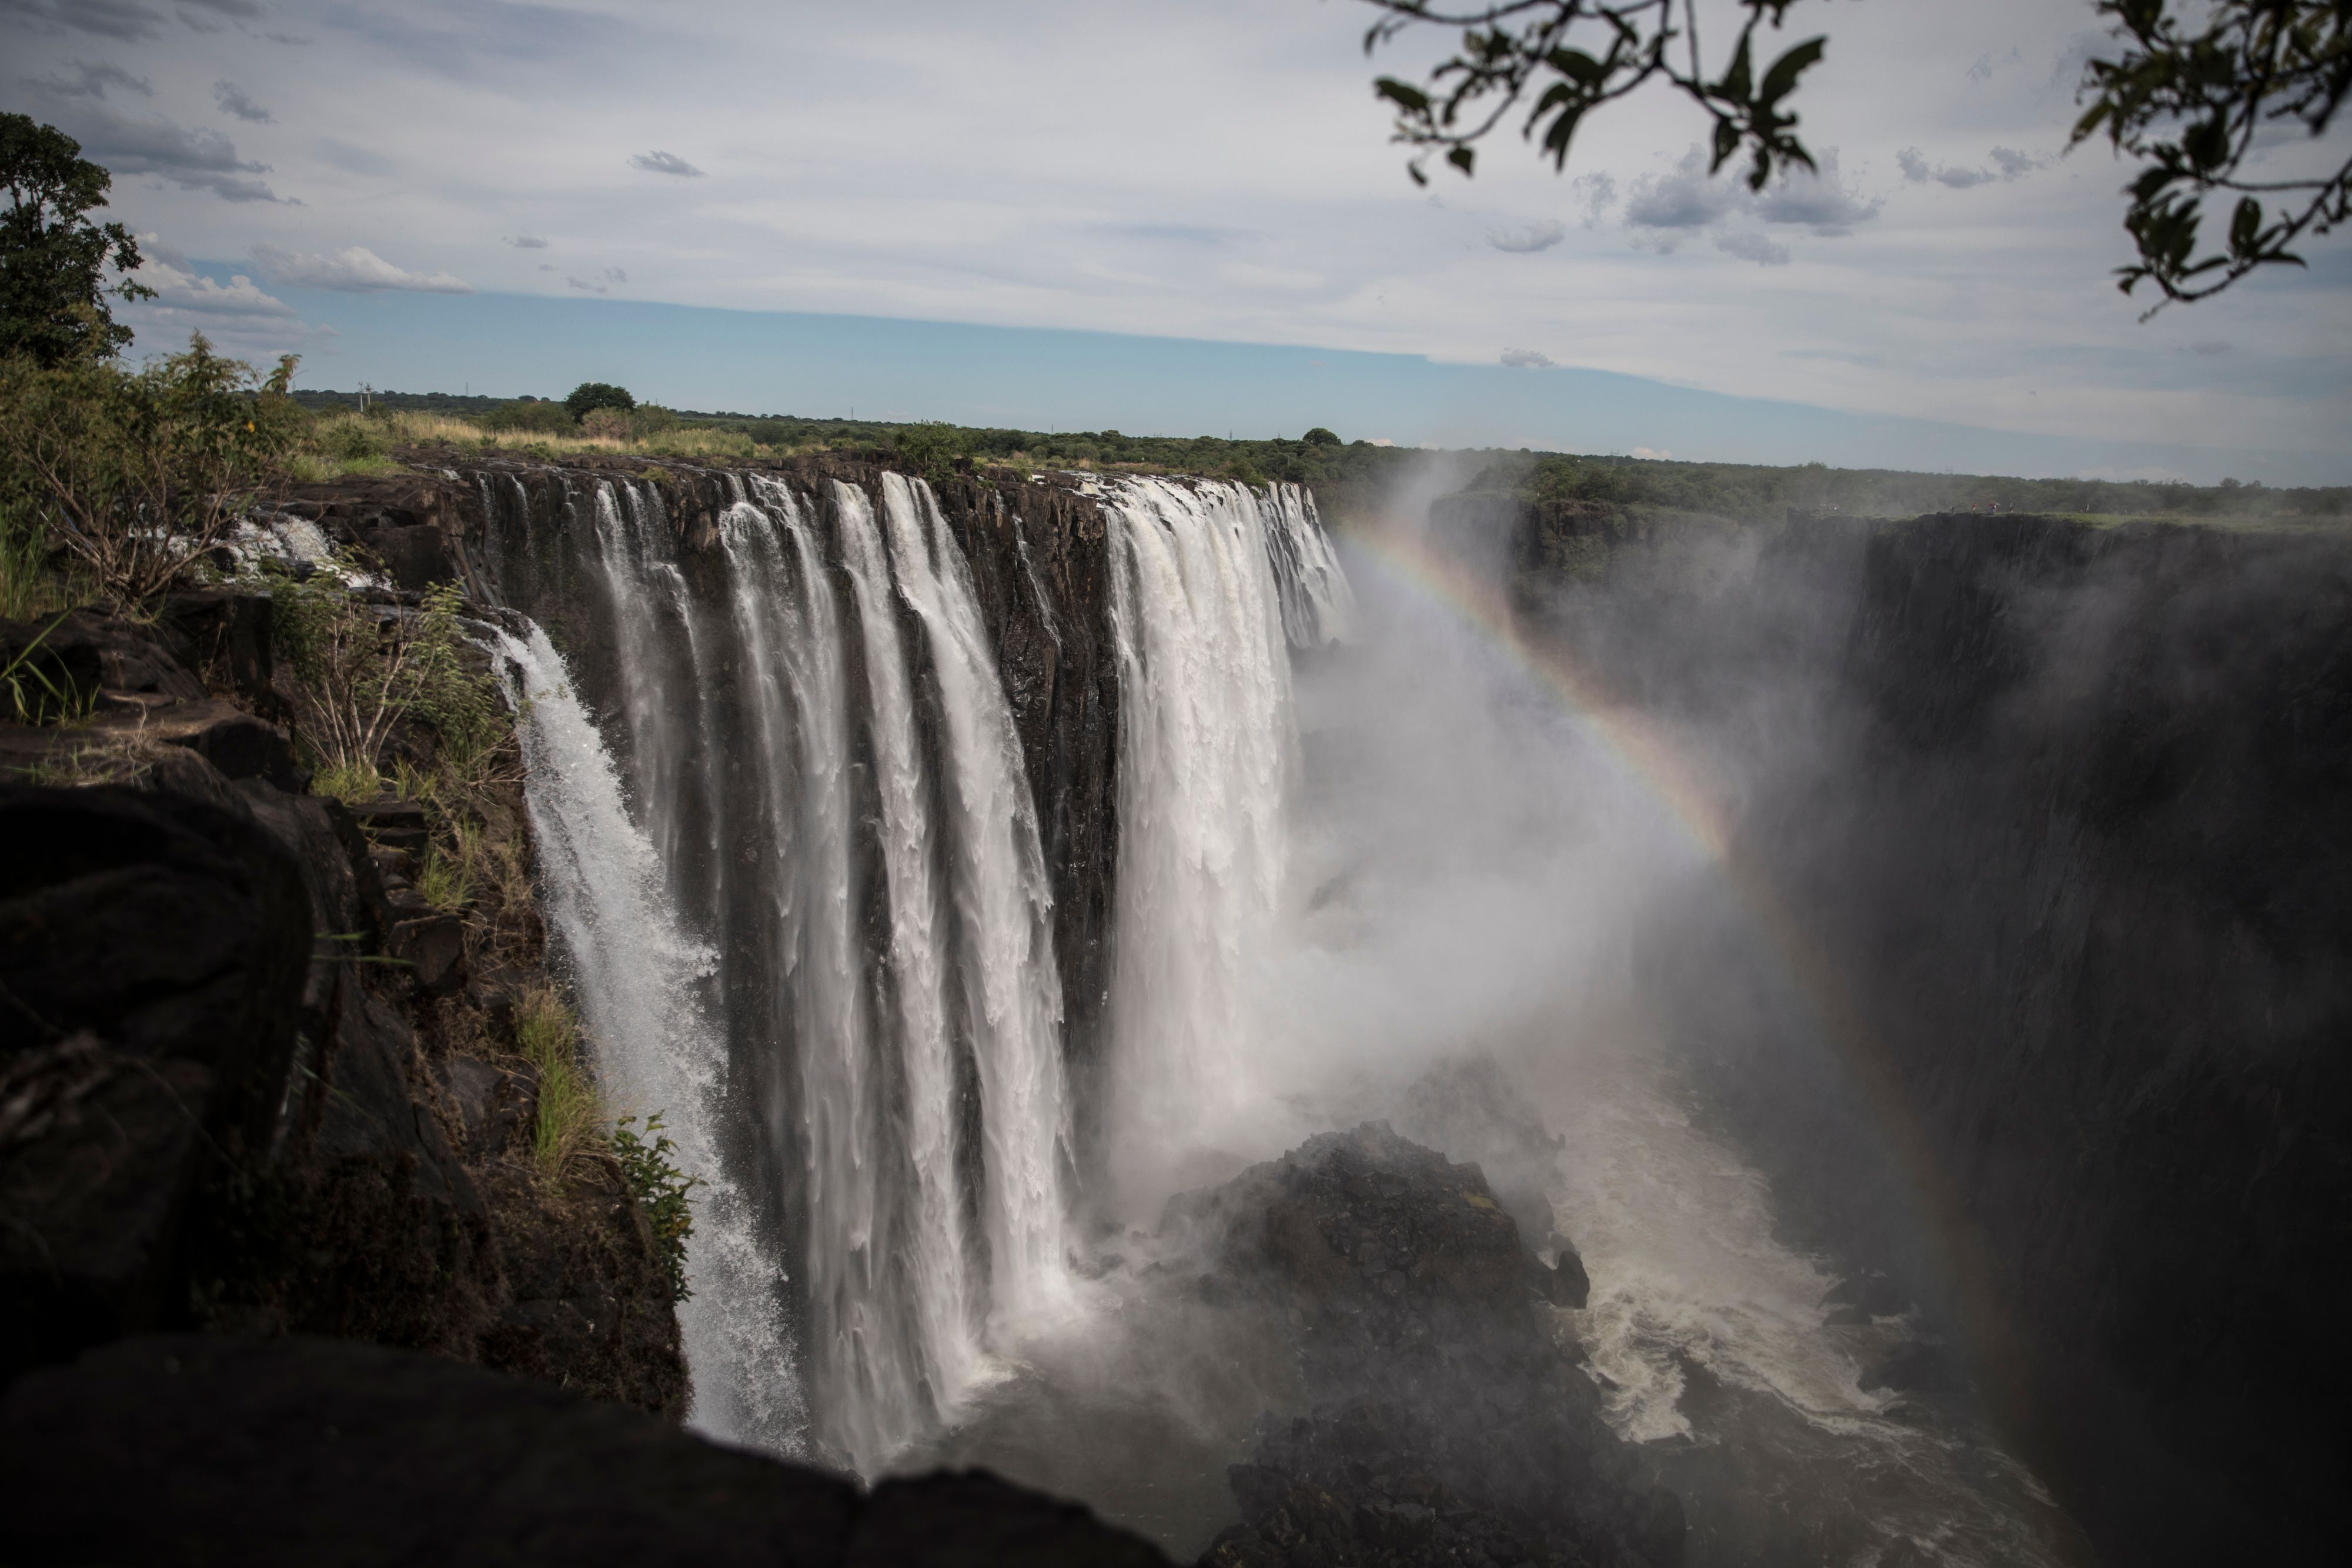 ZAMBIA-CLIMATE-ENVIRONMENT-ECONOMYTOURISM